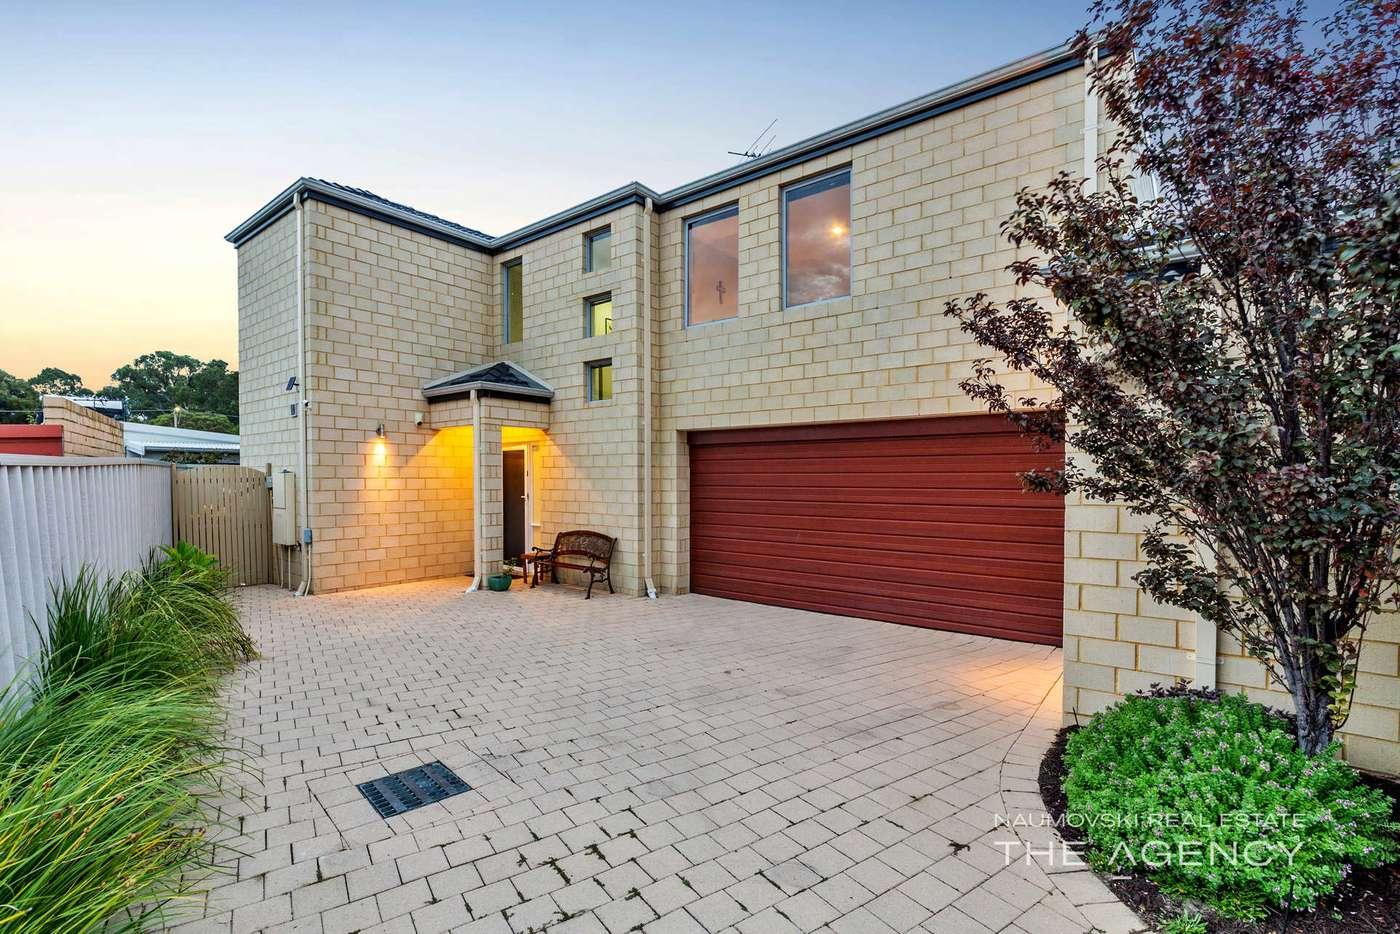 Main view of Homely house listing, 13C Milford Way, Nollamara WA 6061